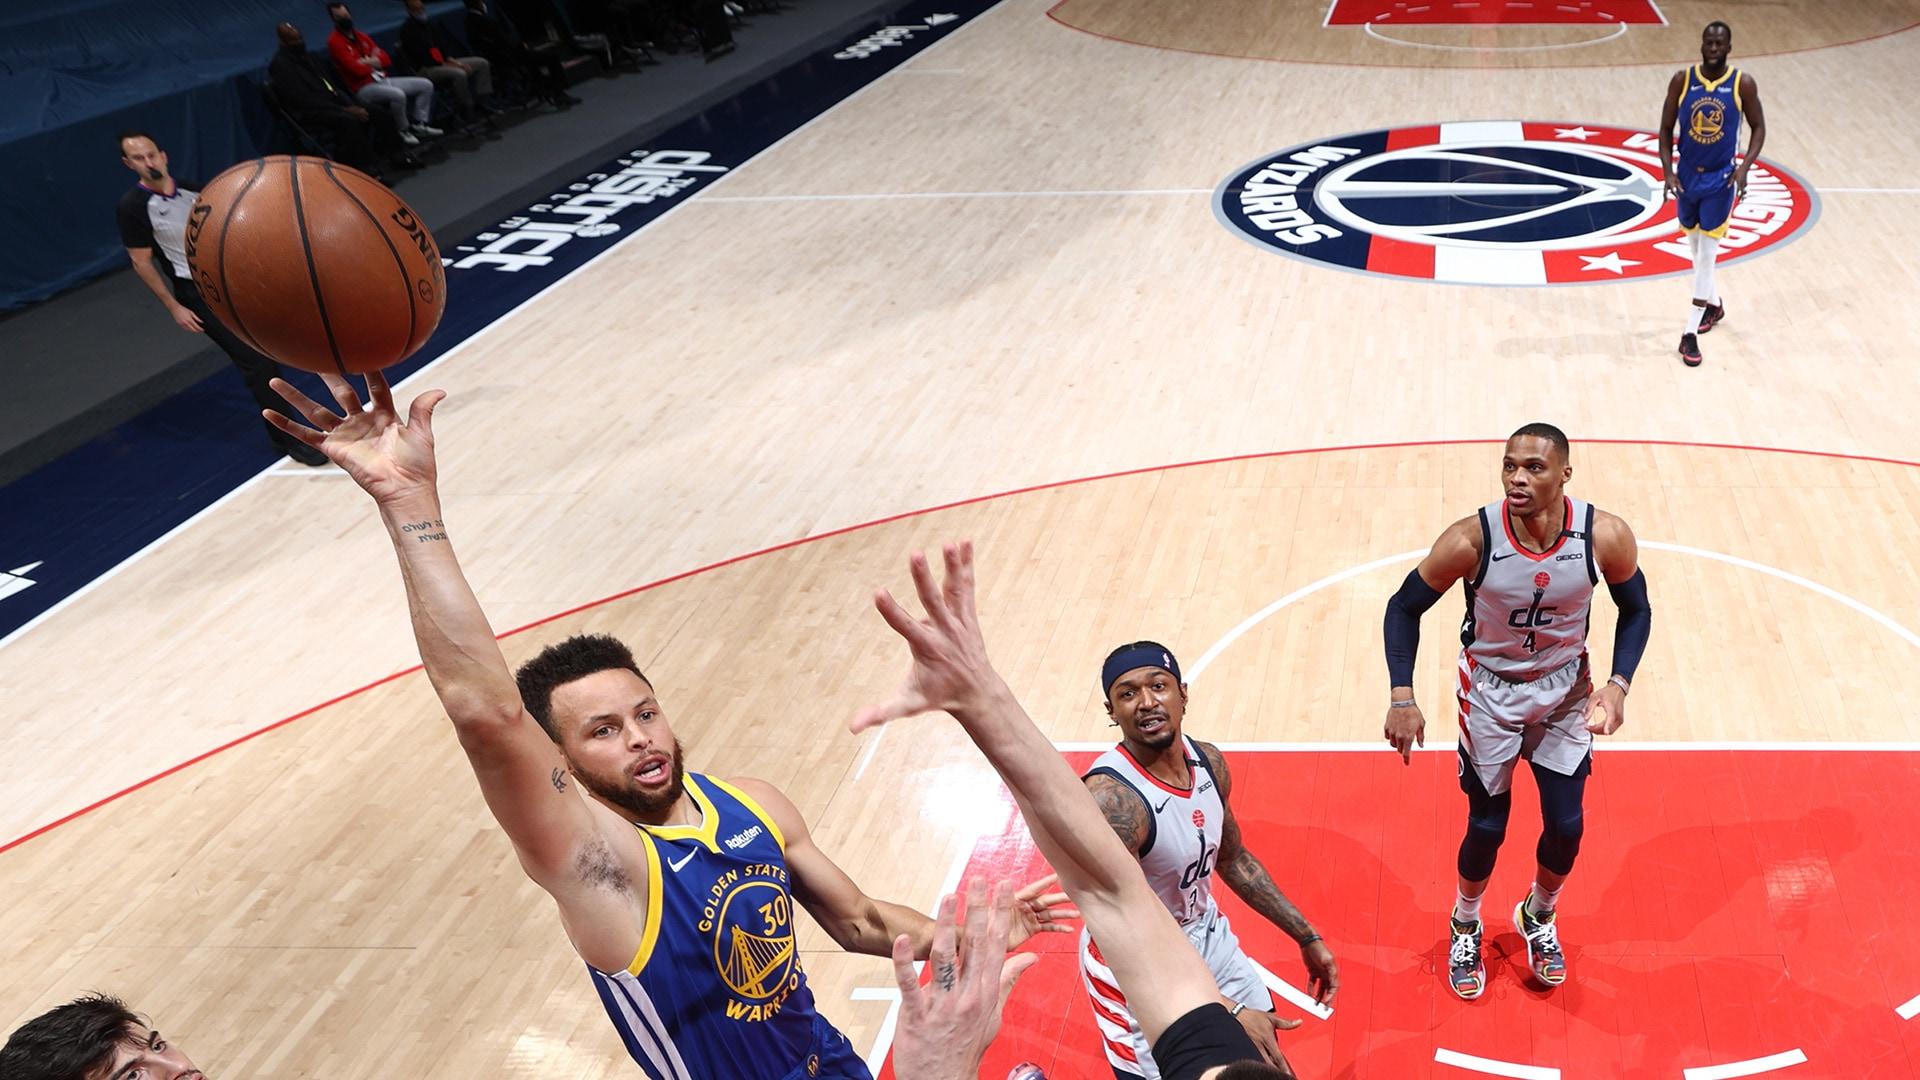 After slow start, Warriors battling back against Wizards